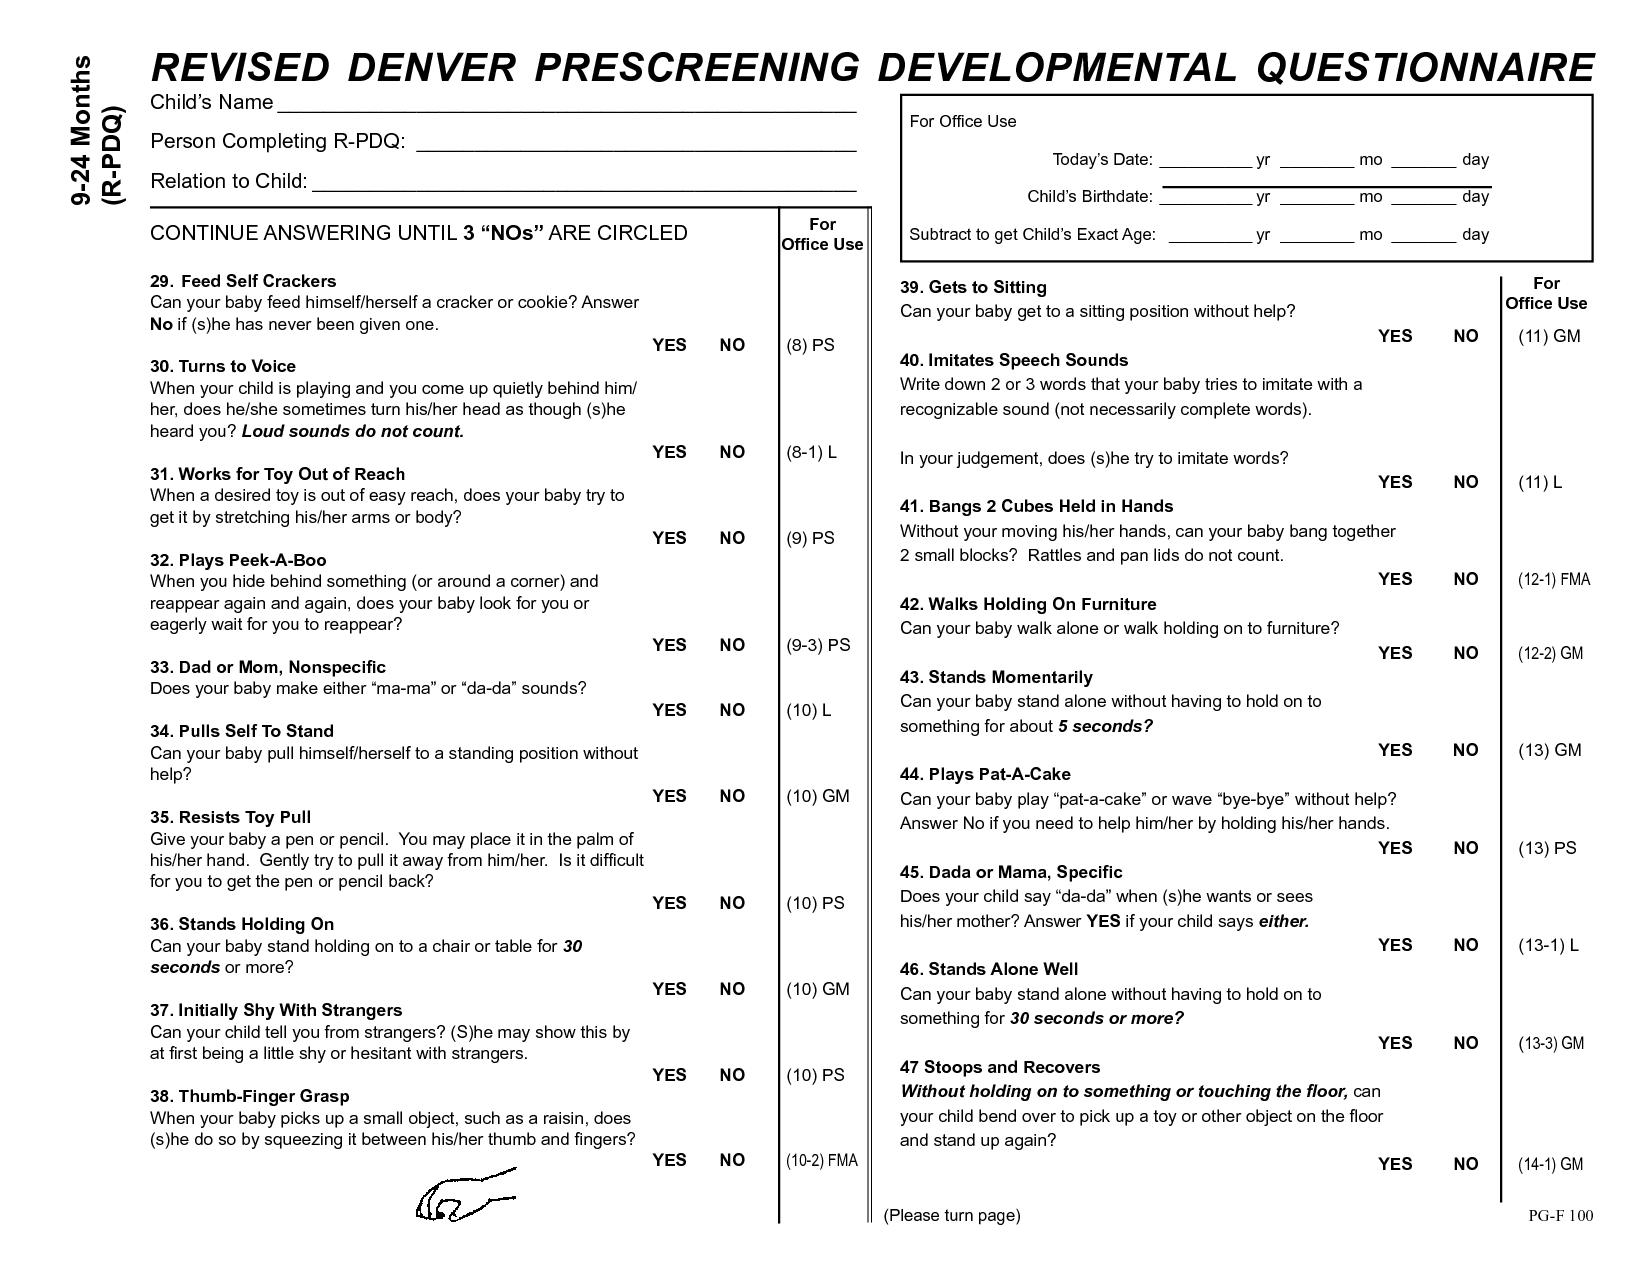 Denver Prescreening Developmental Questionnaire Ii  Google Search